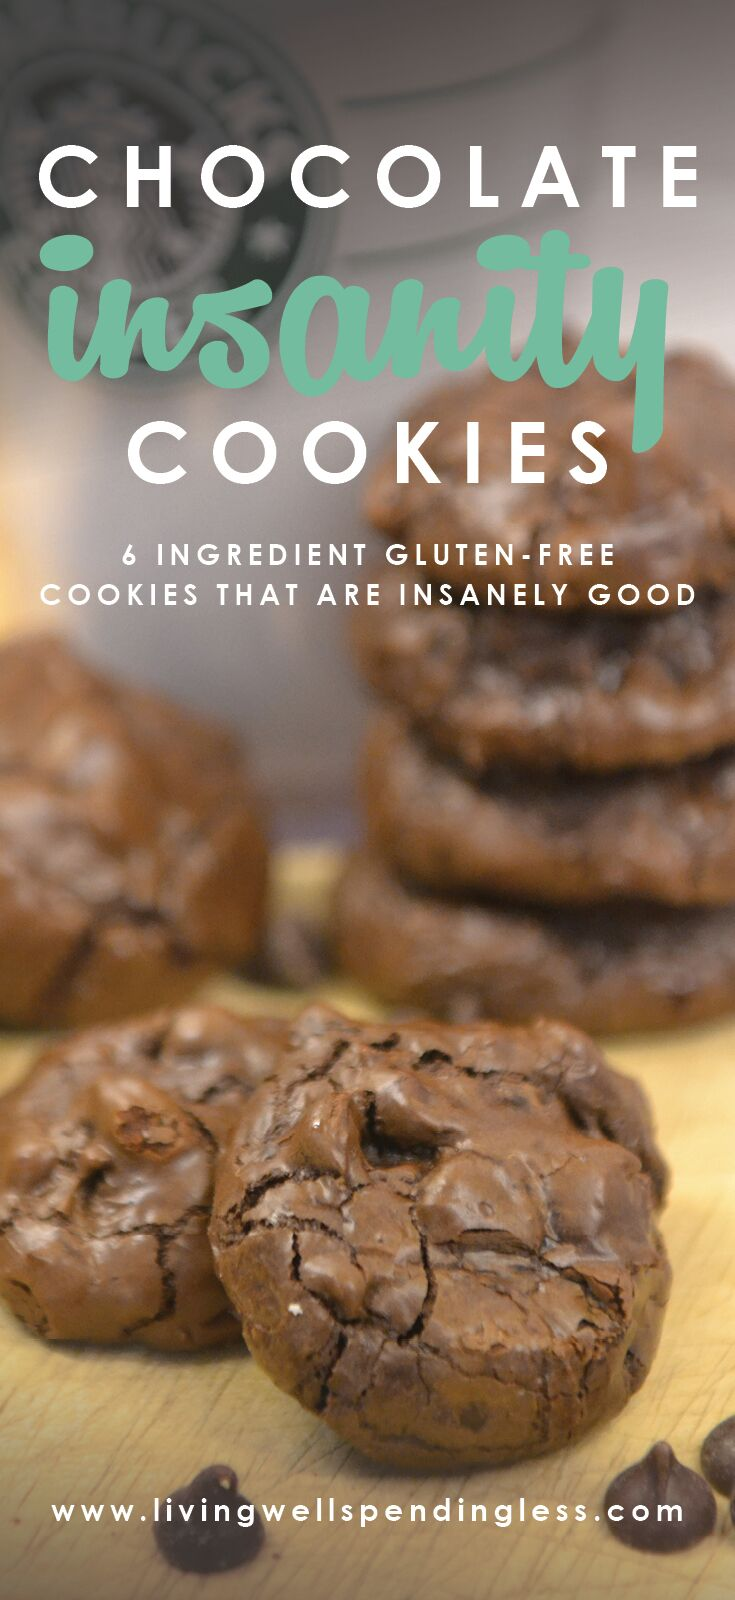 Flourless Chocolate Cookies | Chocolate Cookie Recipe | Flourless Cookie Recipe | Flourless Chocolate Cookie Recipe | Cookie Recipe | Choco Chip Cookies | DIY Flourless Chocolate Cookies | gluten free | gluten free cookies